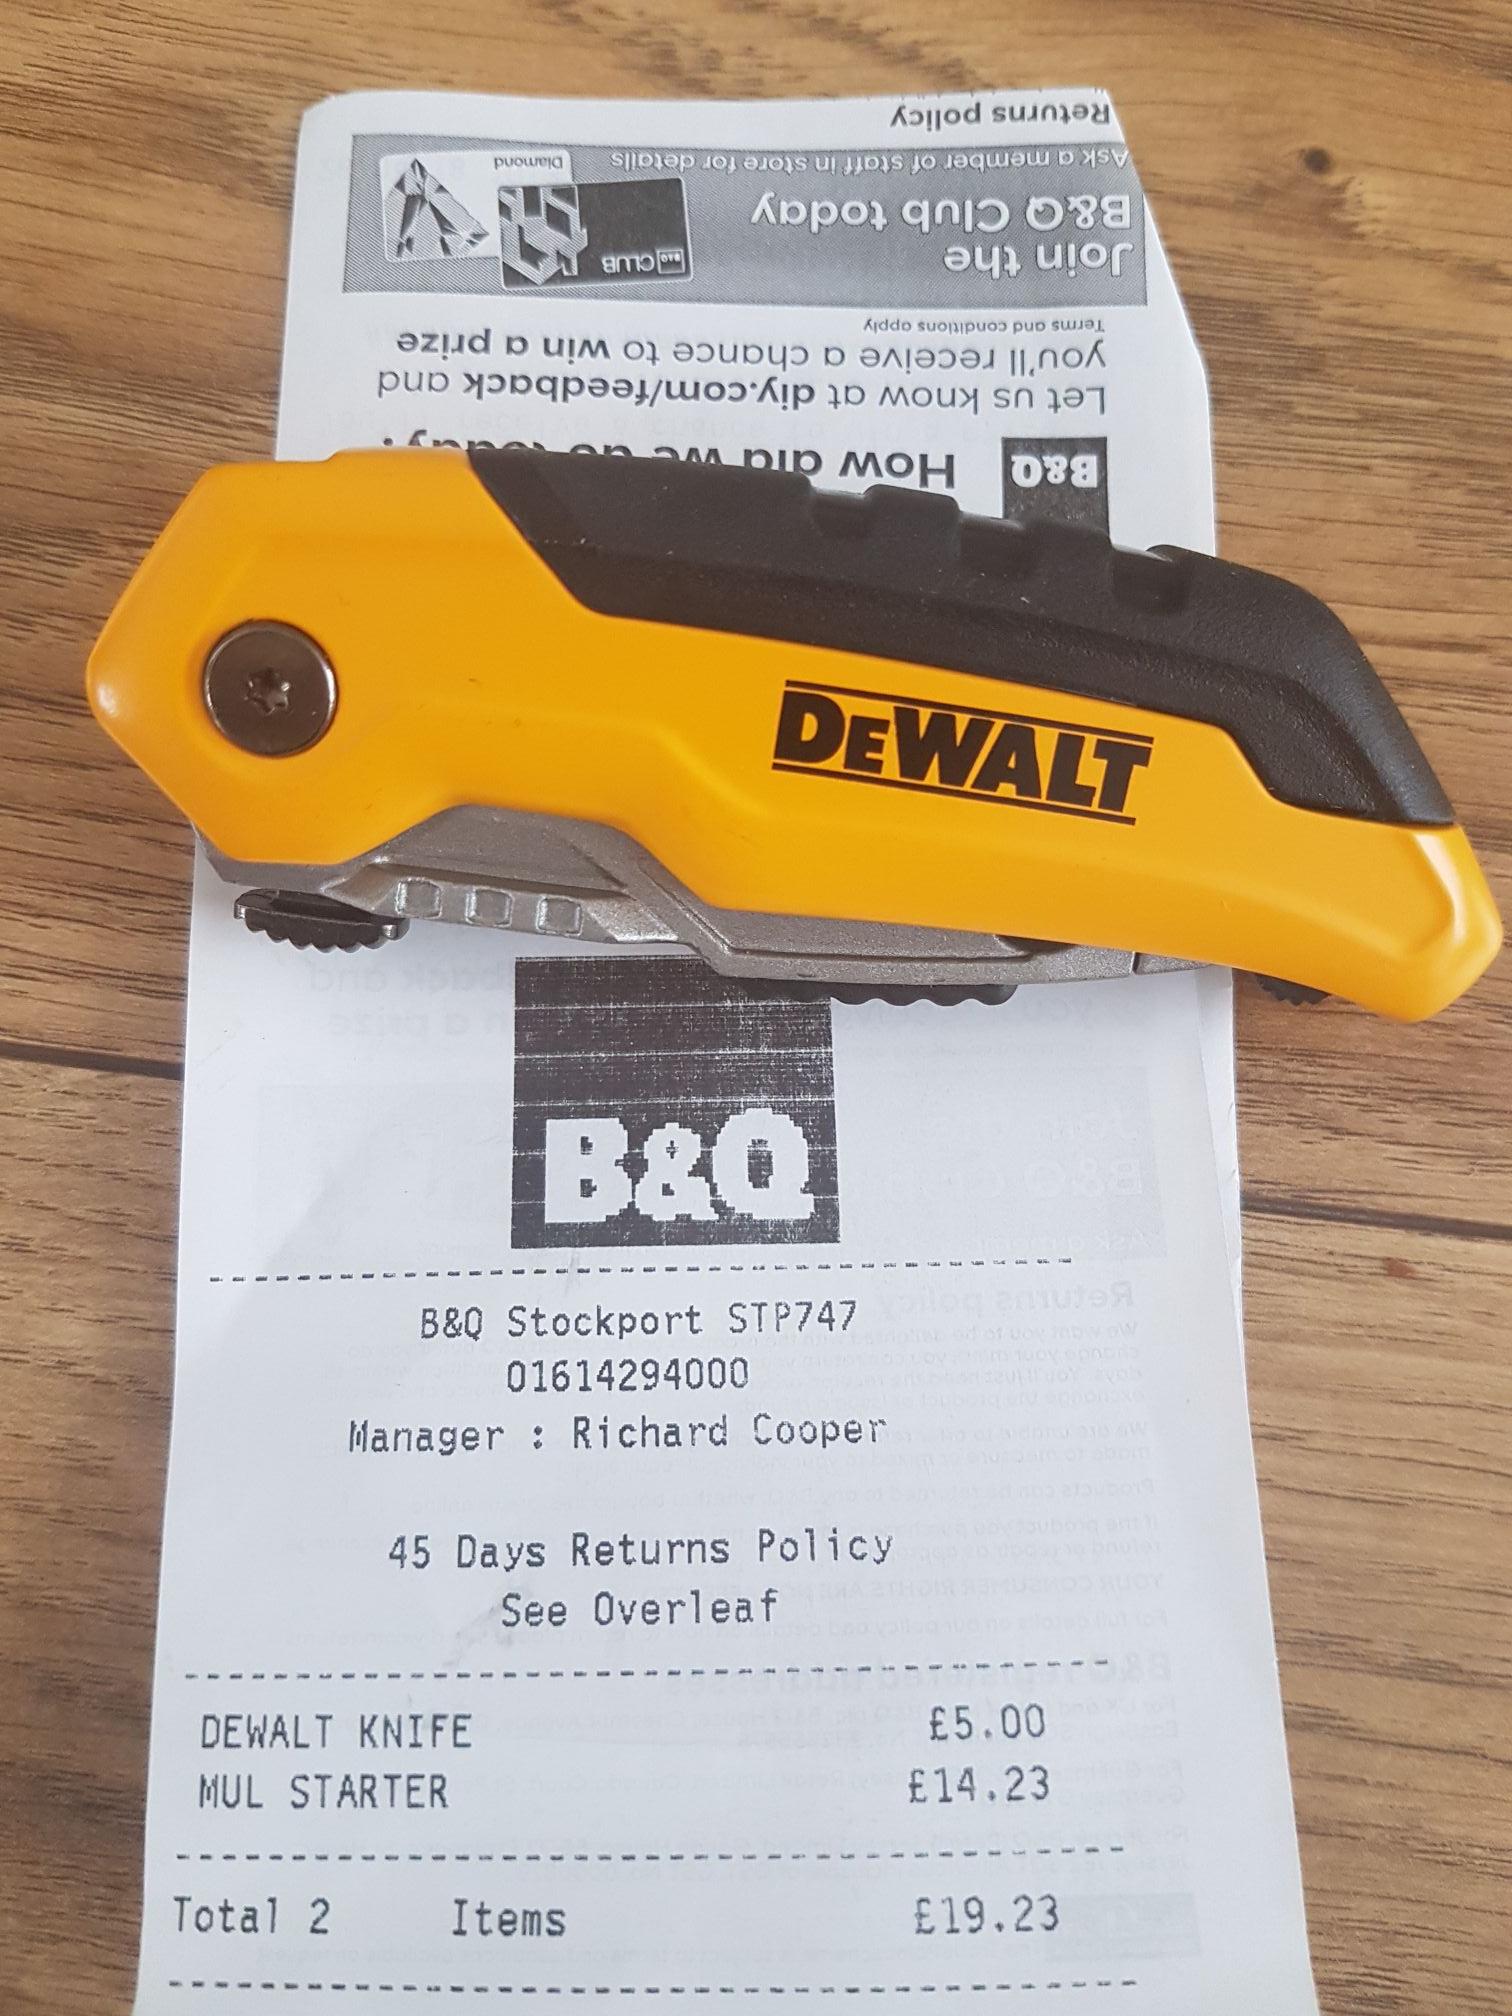 Dewalt folding utility knife £5 @ B & Q stockport